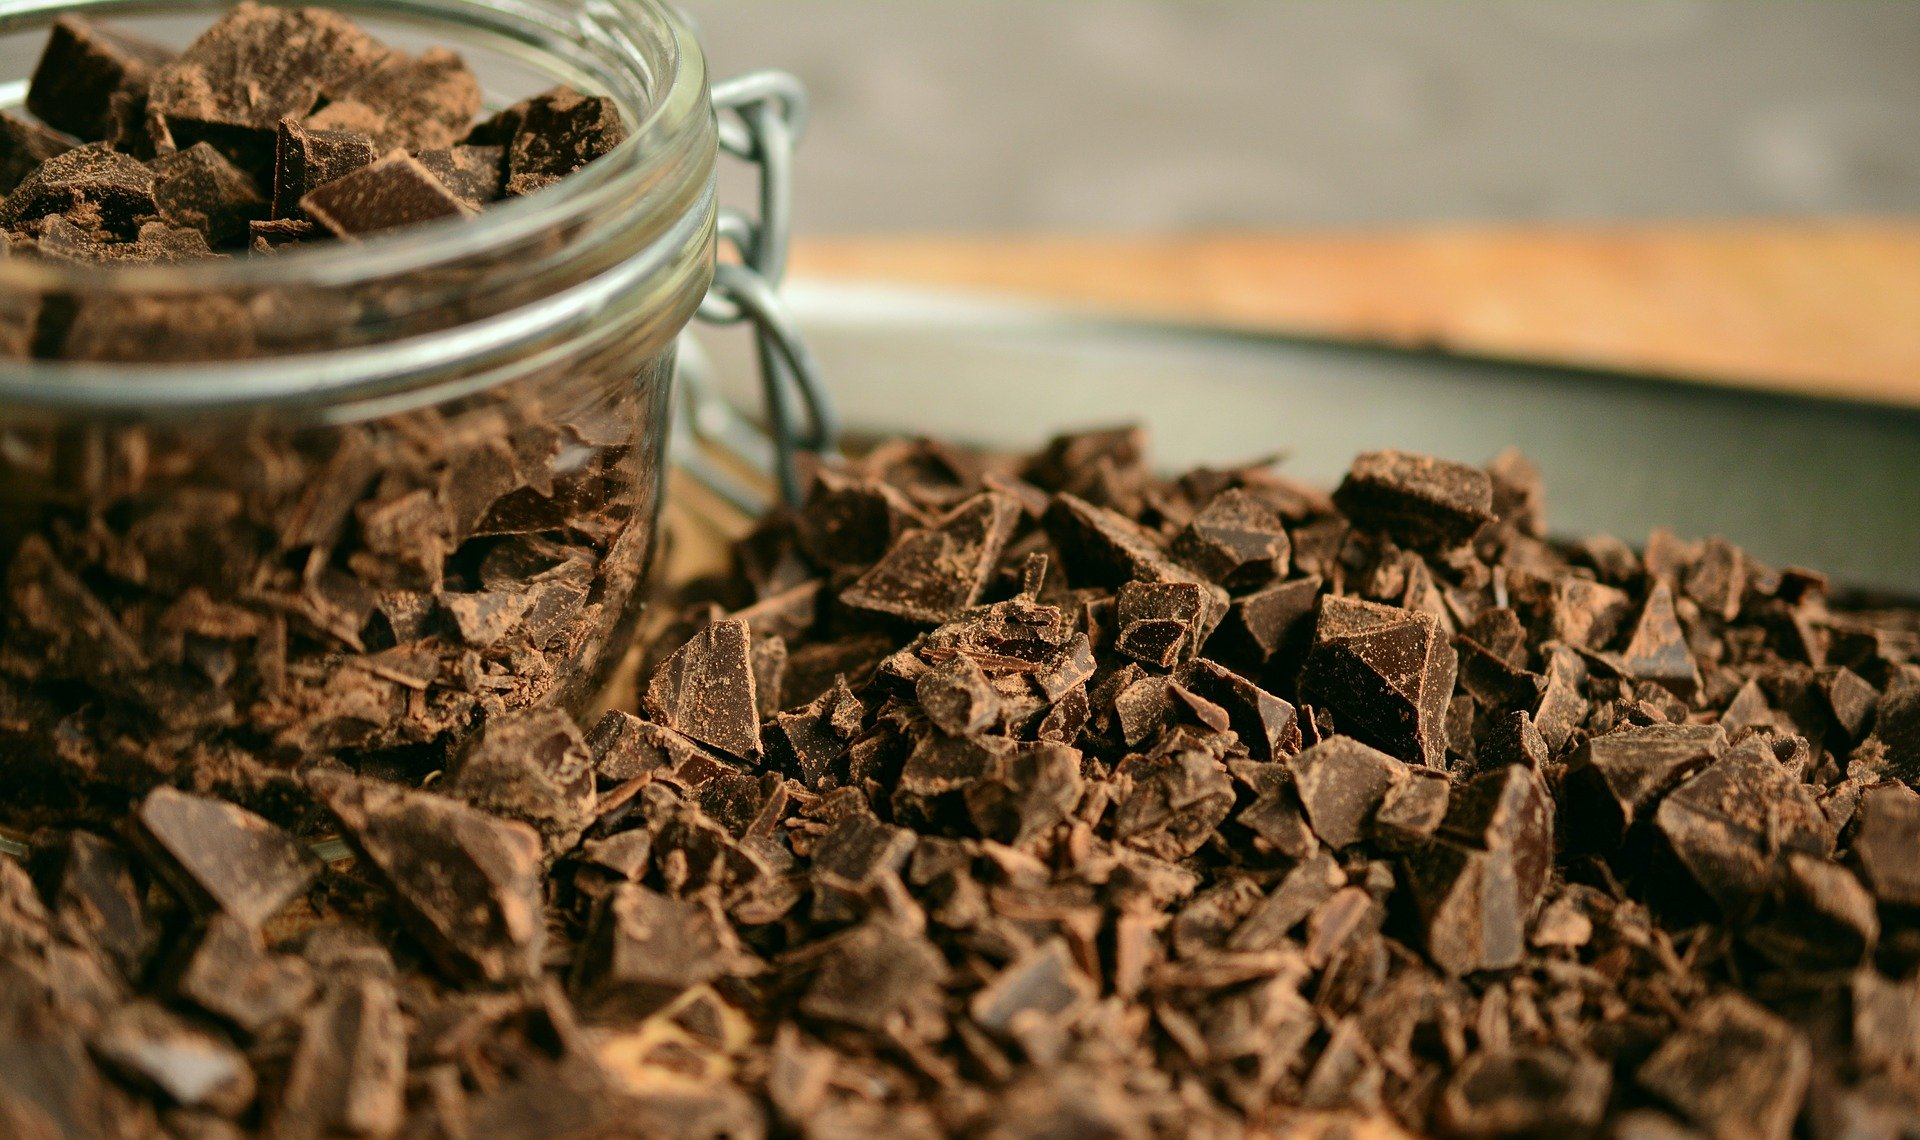 Trossets de xocolata | Pixabay